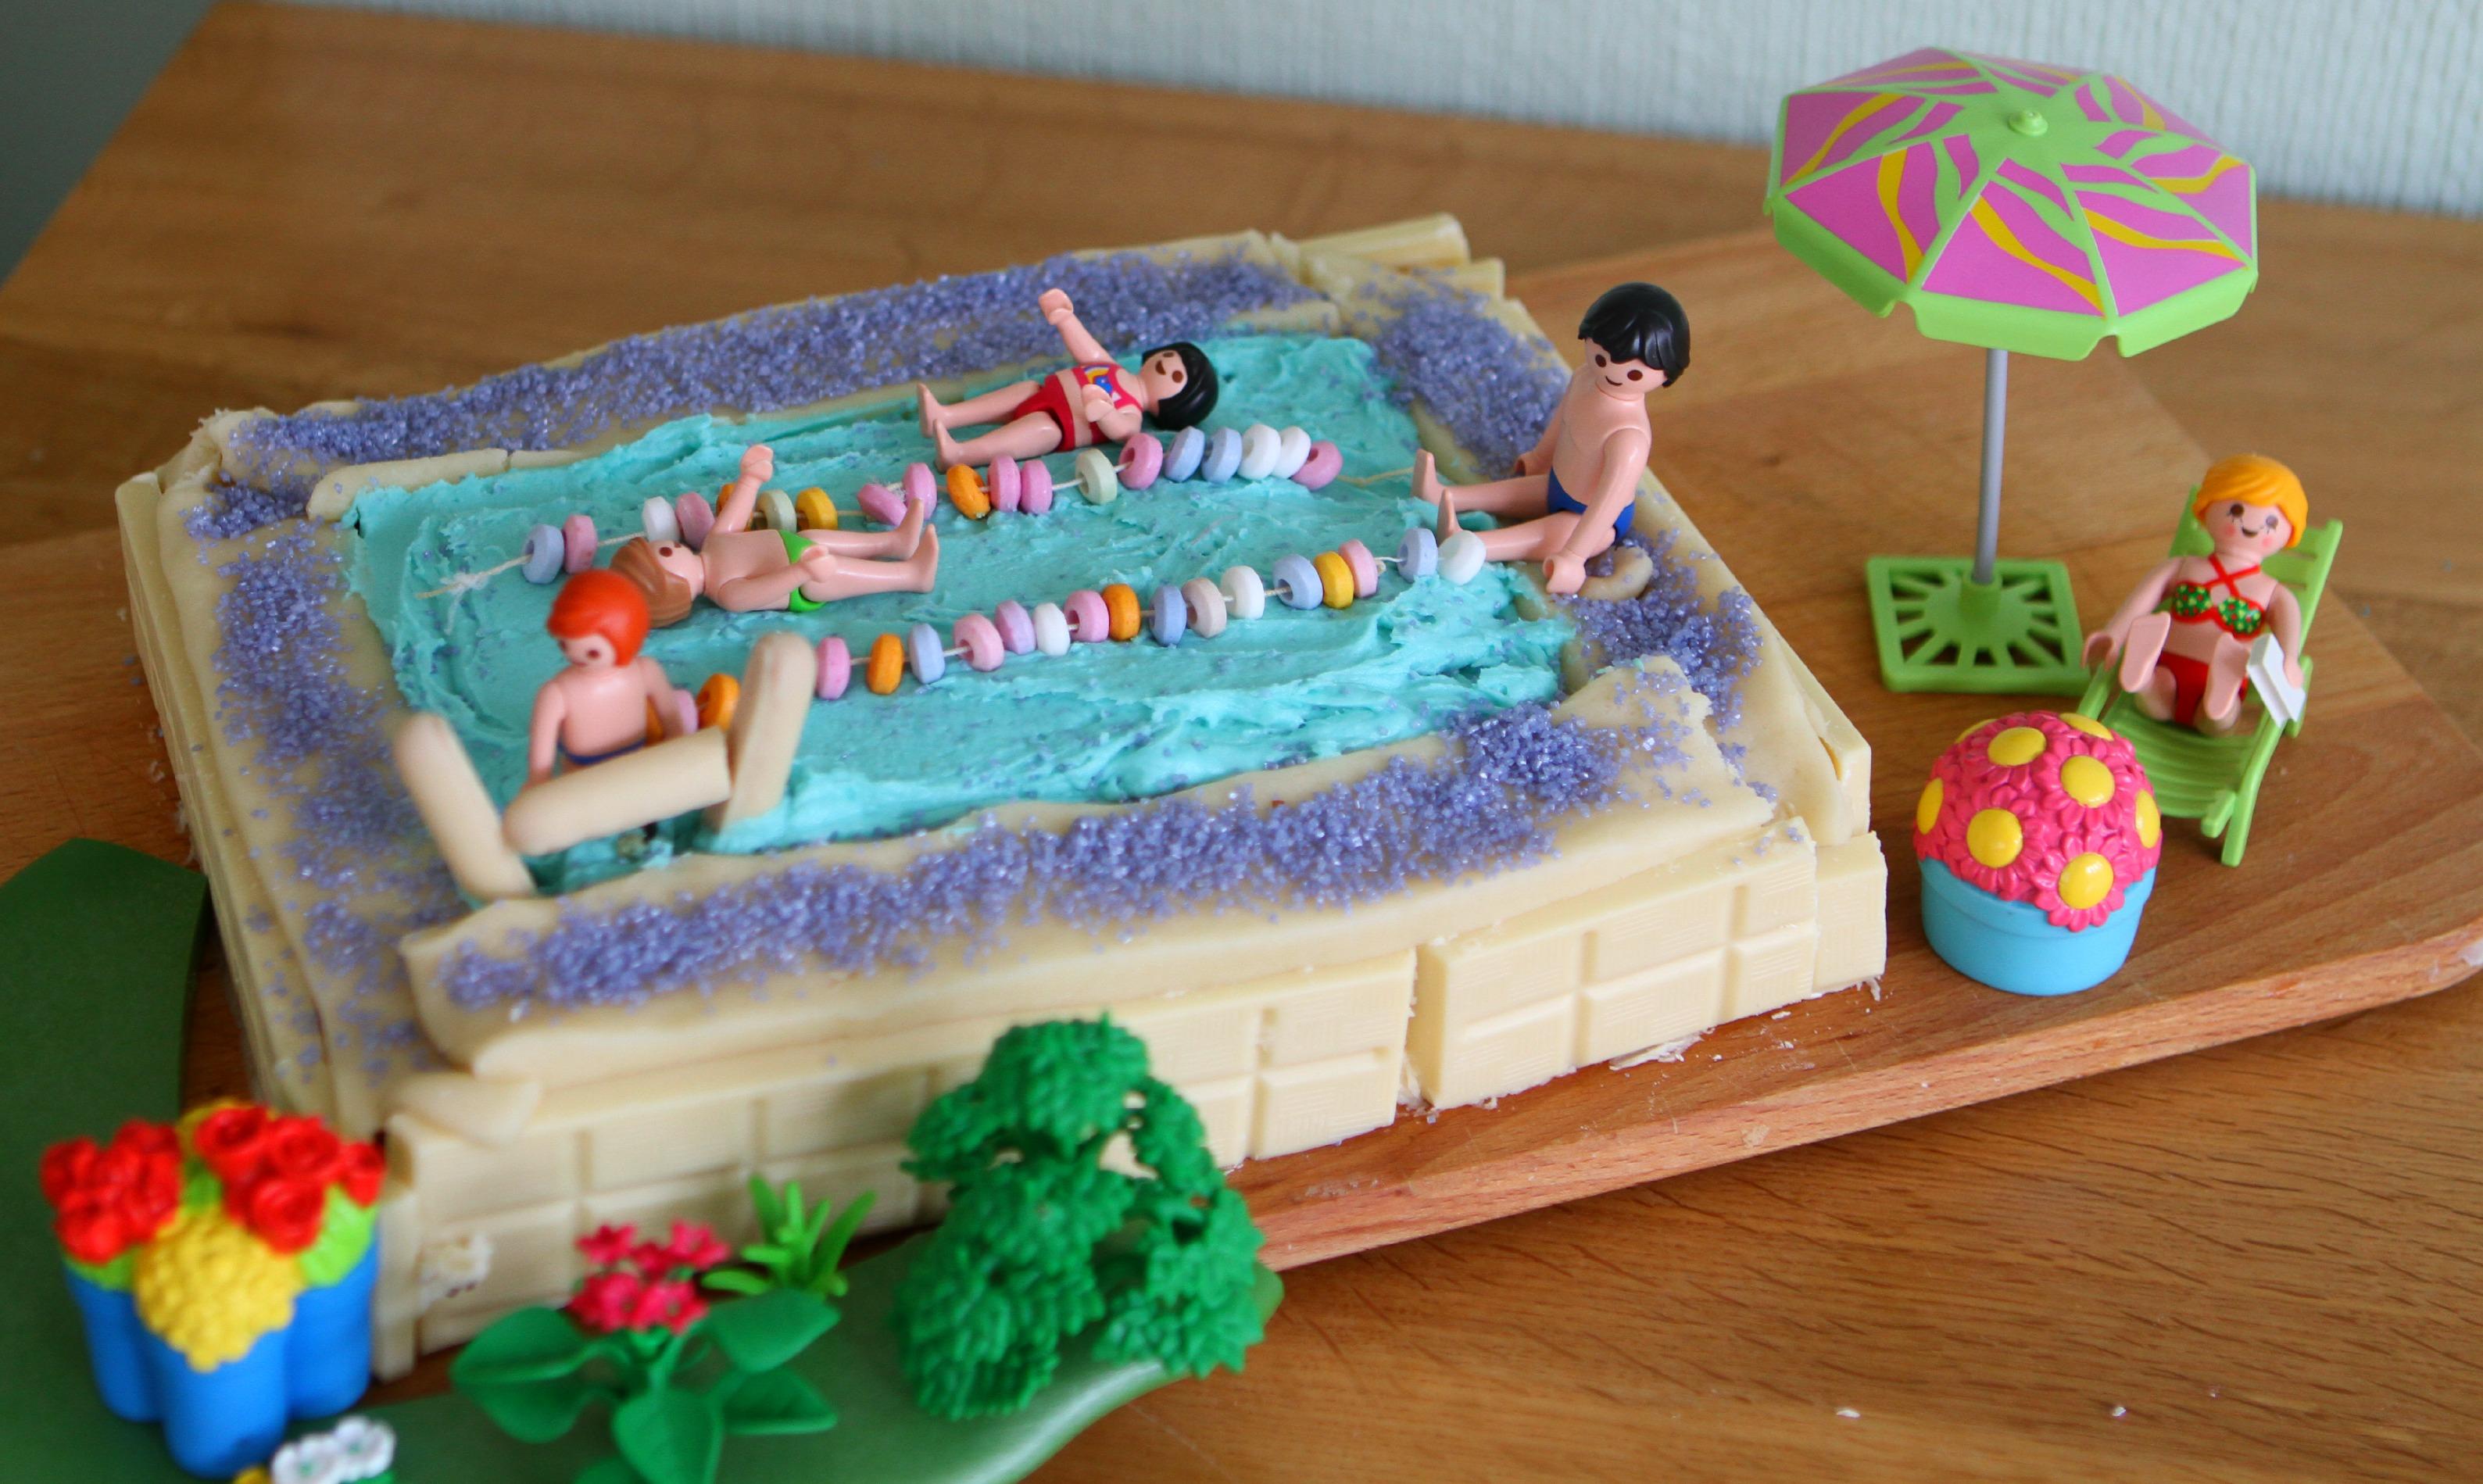 Swimming Pool Cake Team Honk Bake Off Mummy Mishaps